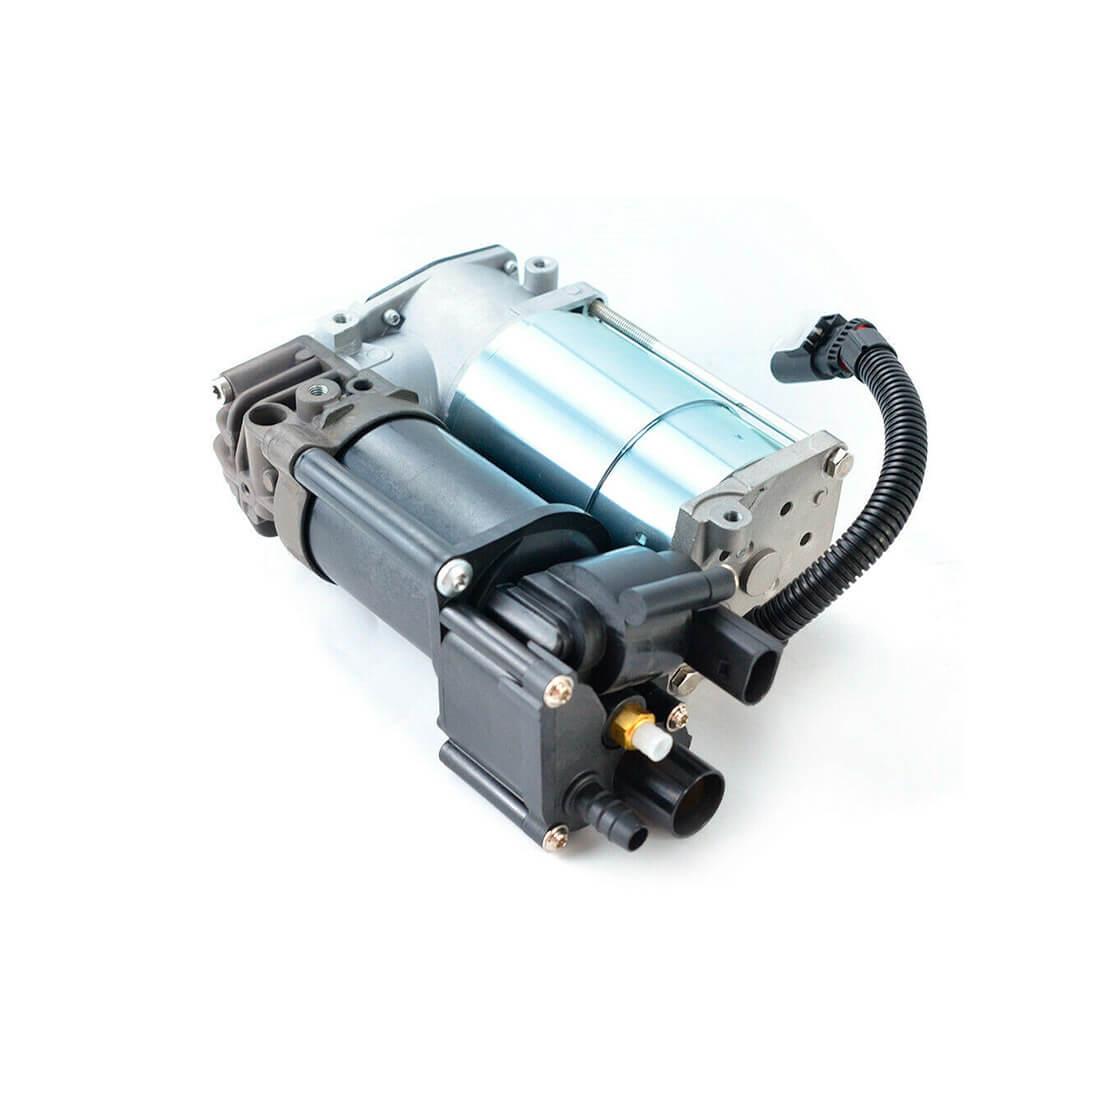 00673 Compresor Bmw X5 F15 37206875177 37206868998 37206850555 1.jpg